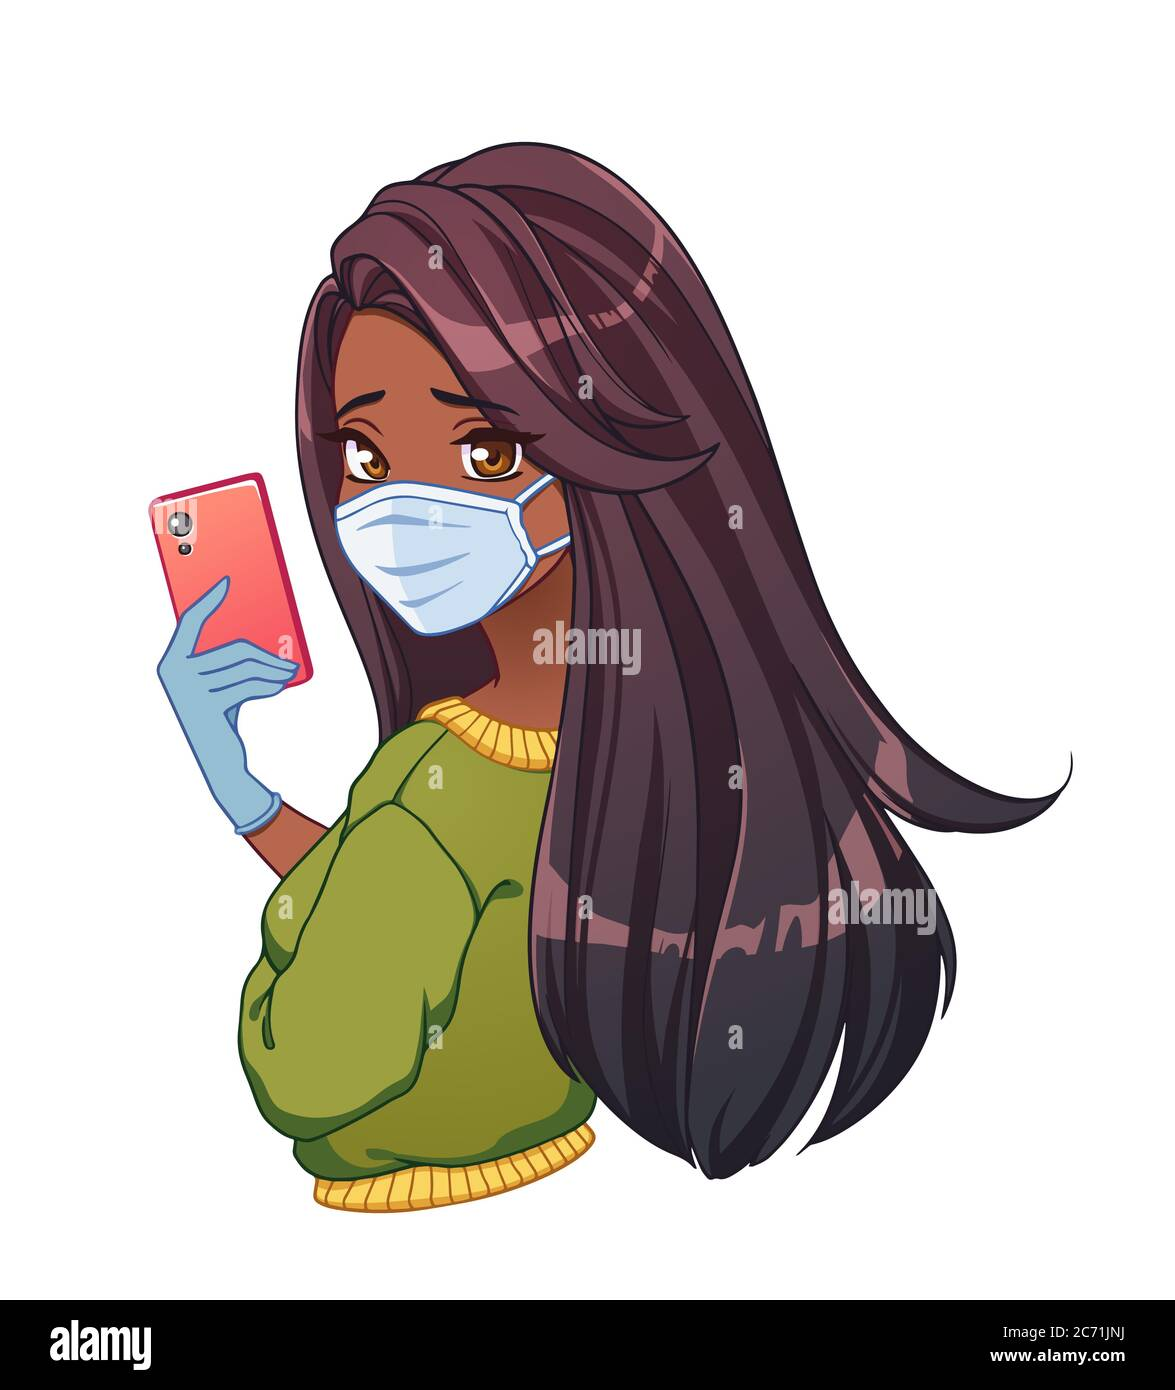 Pretty cartoon girl with tan skin and long black hair taking